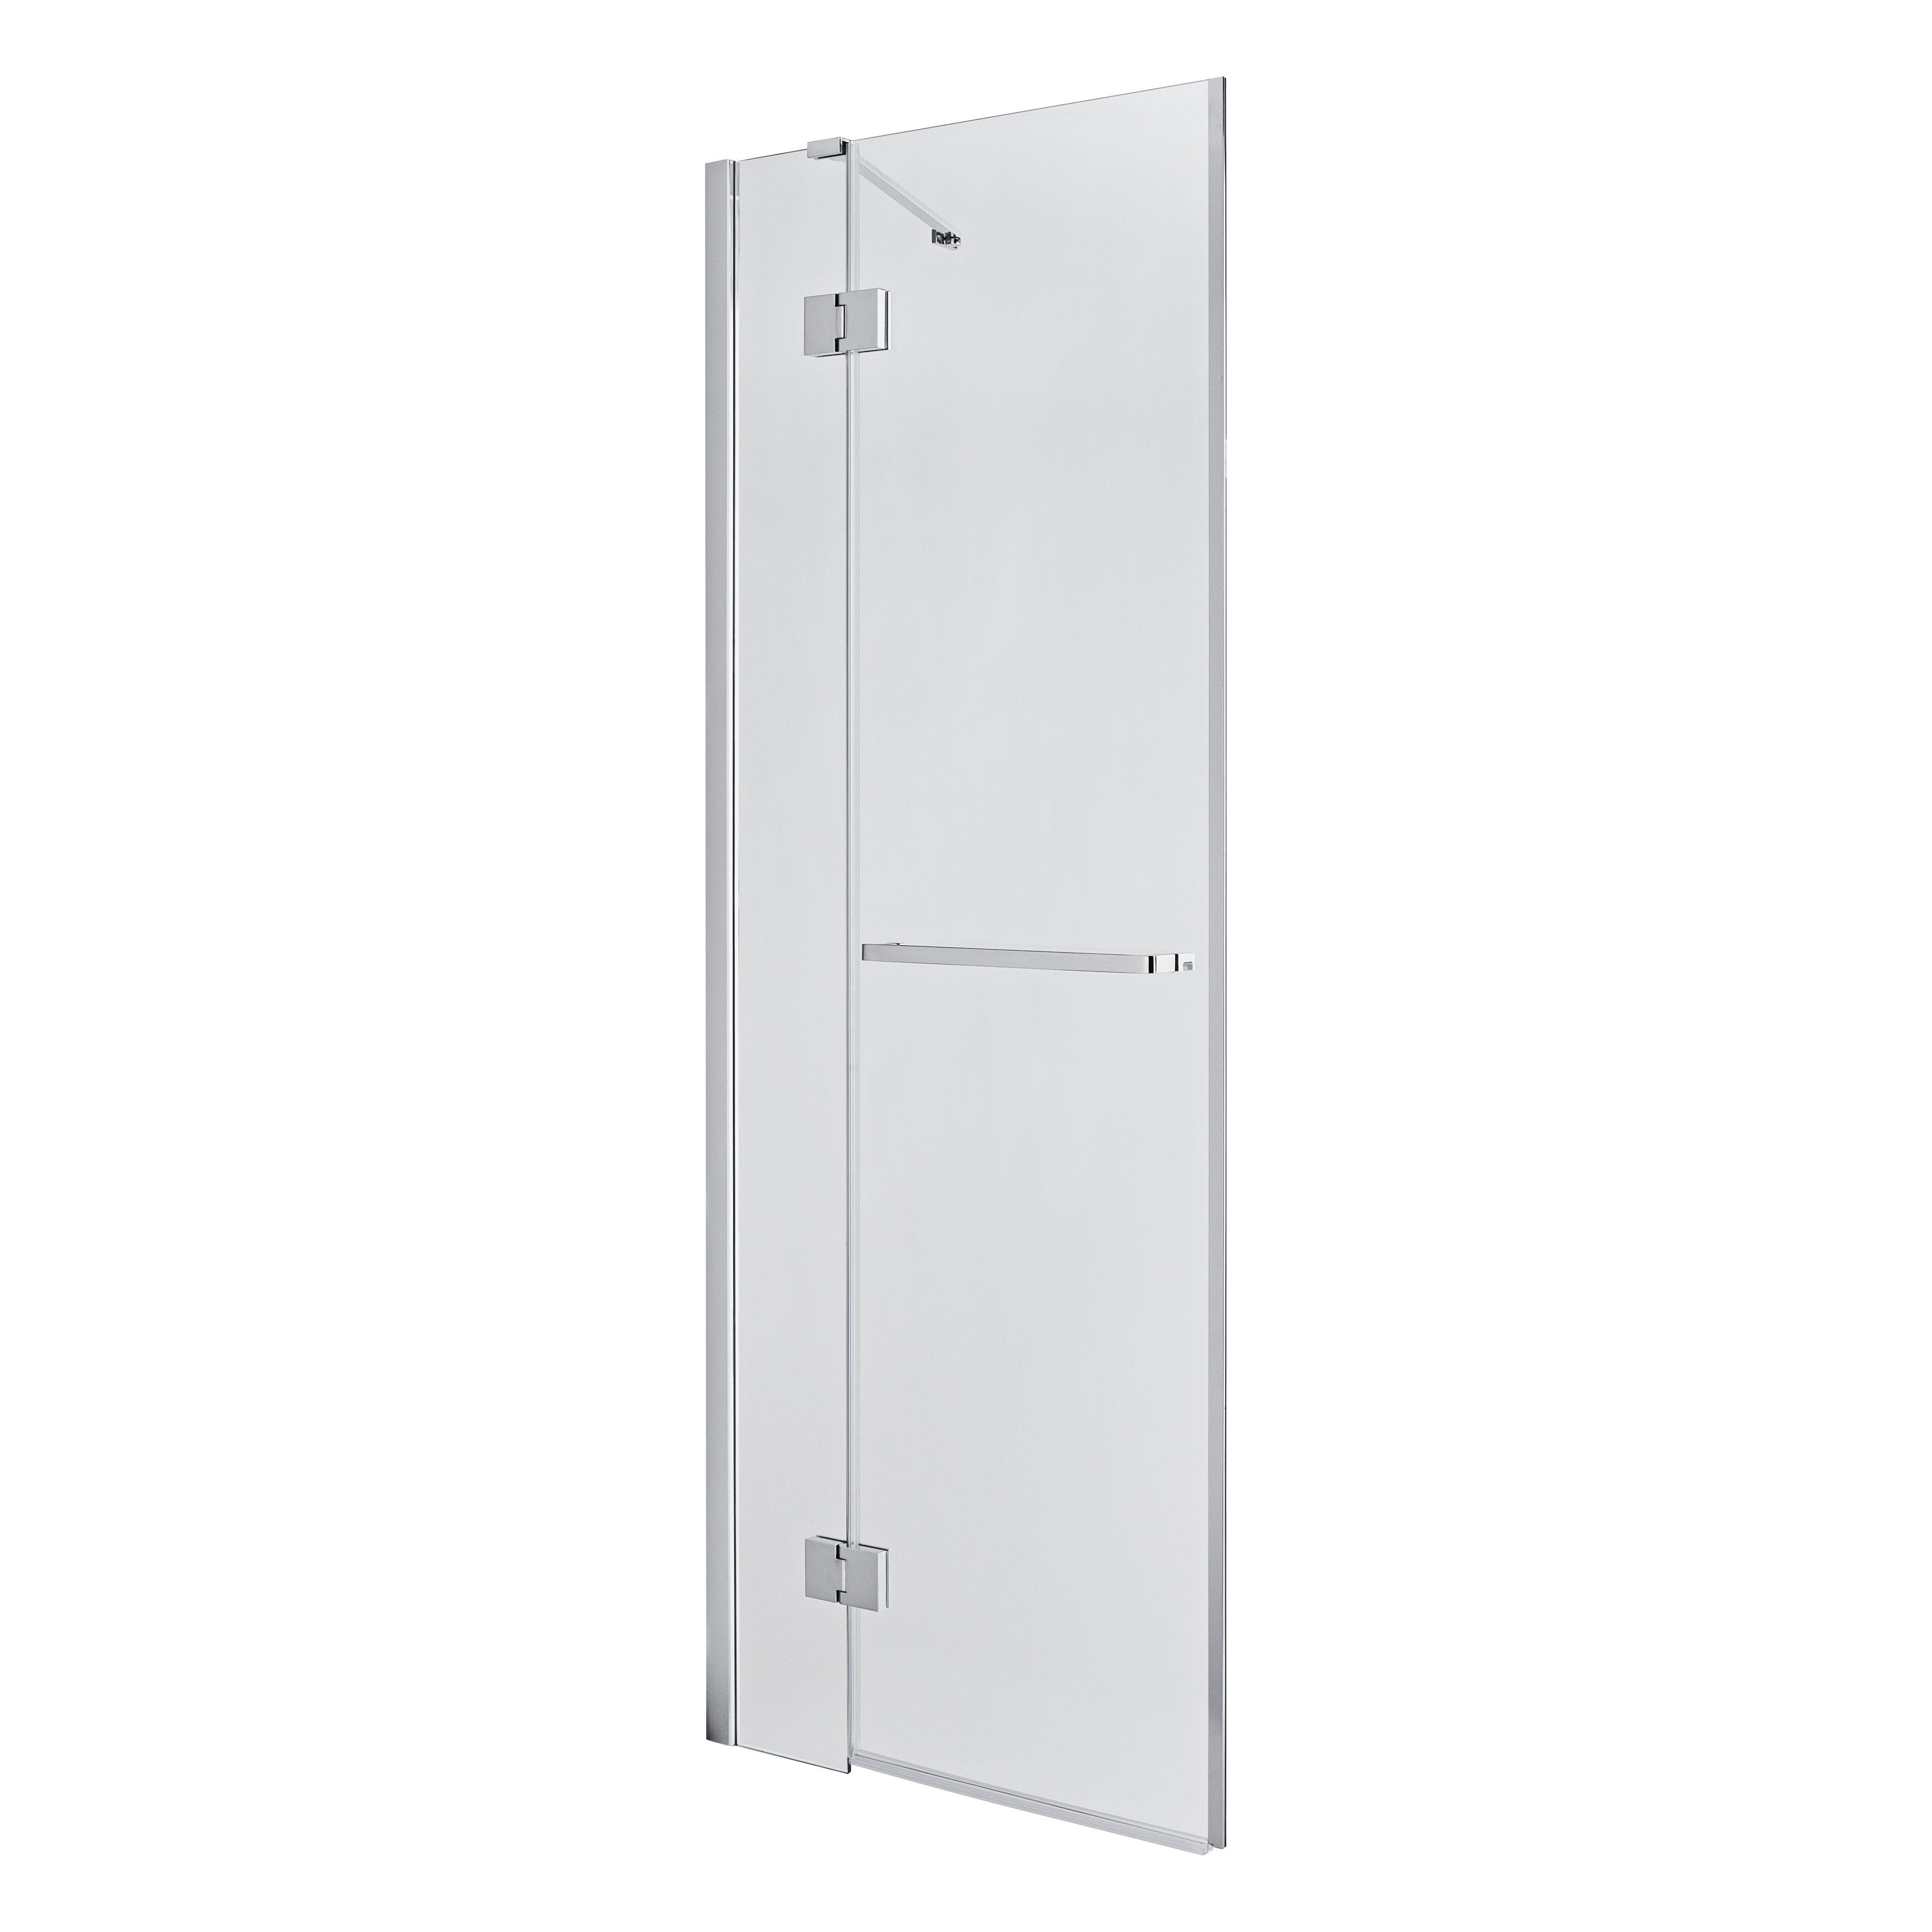 Goodhome Naya Pivot Shower Door W 800mm Departments Diy At B Q